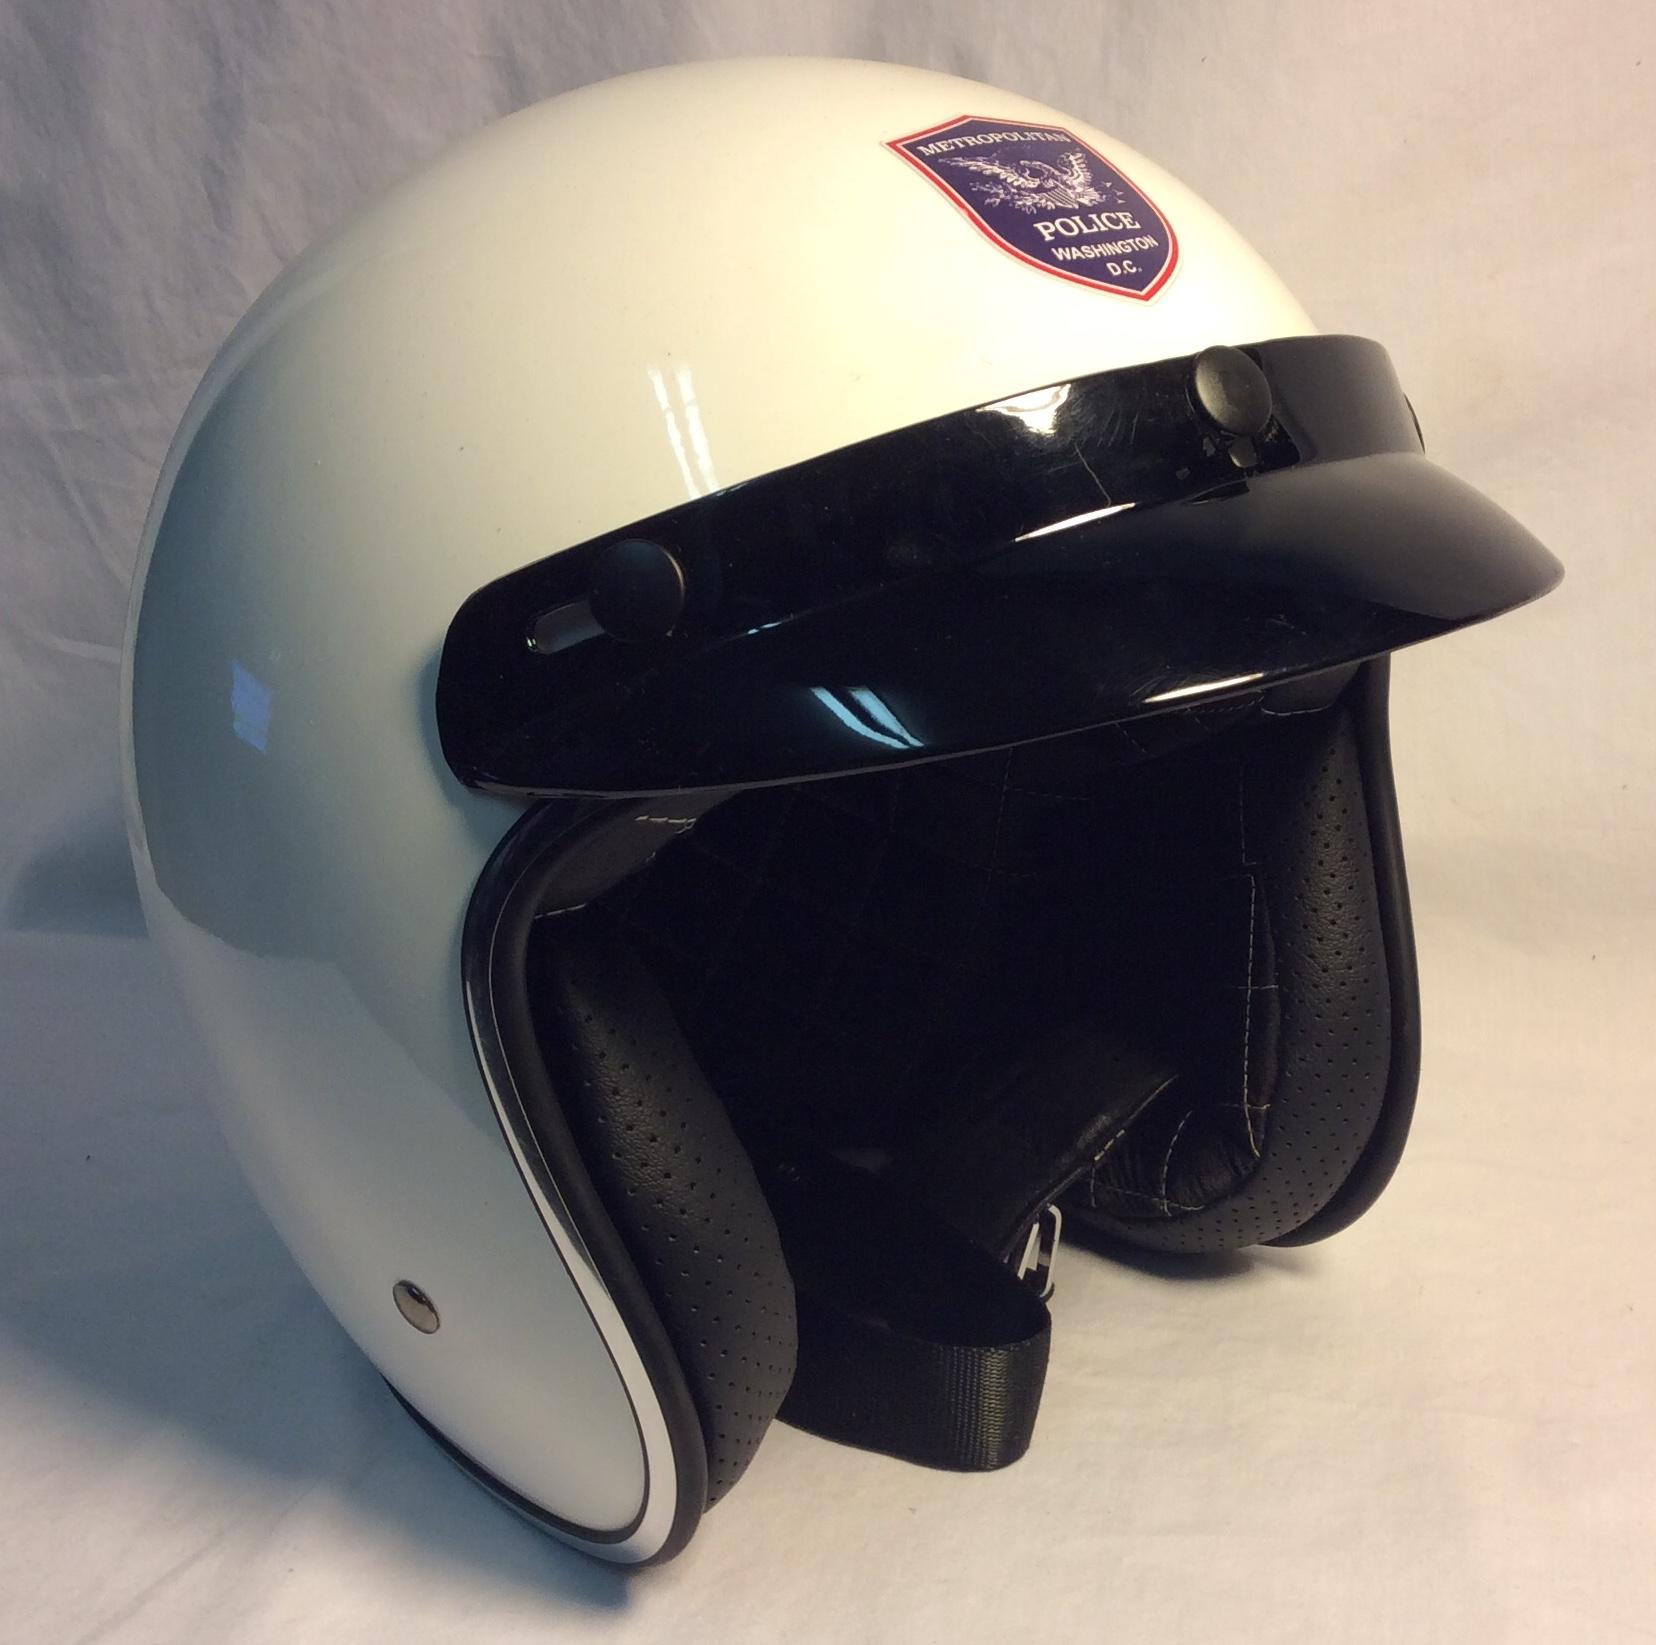 White Police Motorcycle Helmet